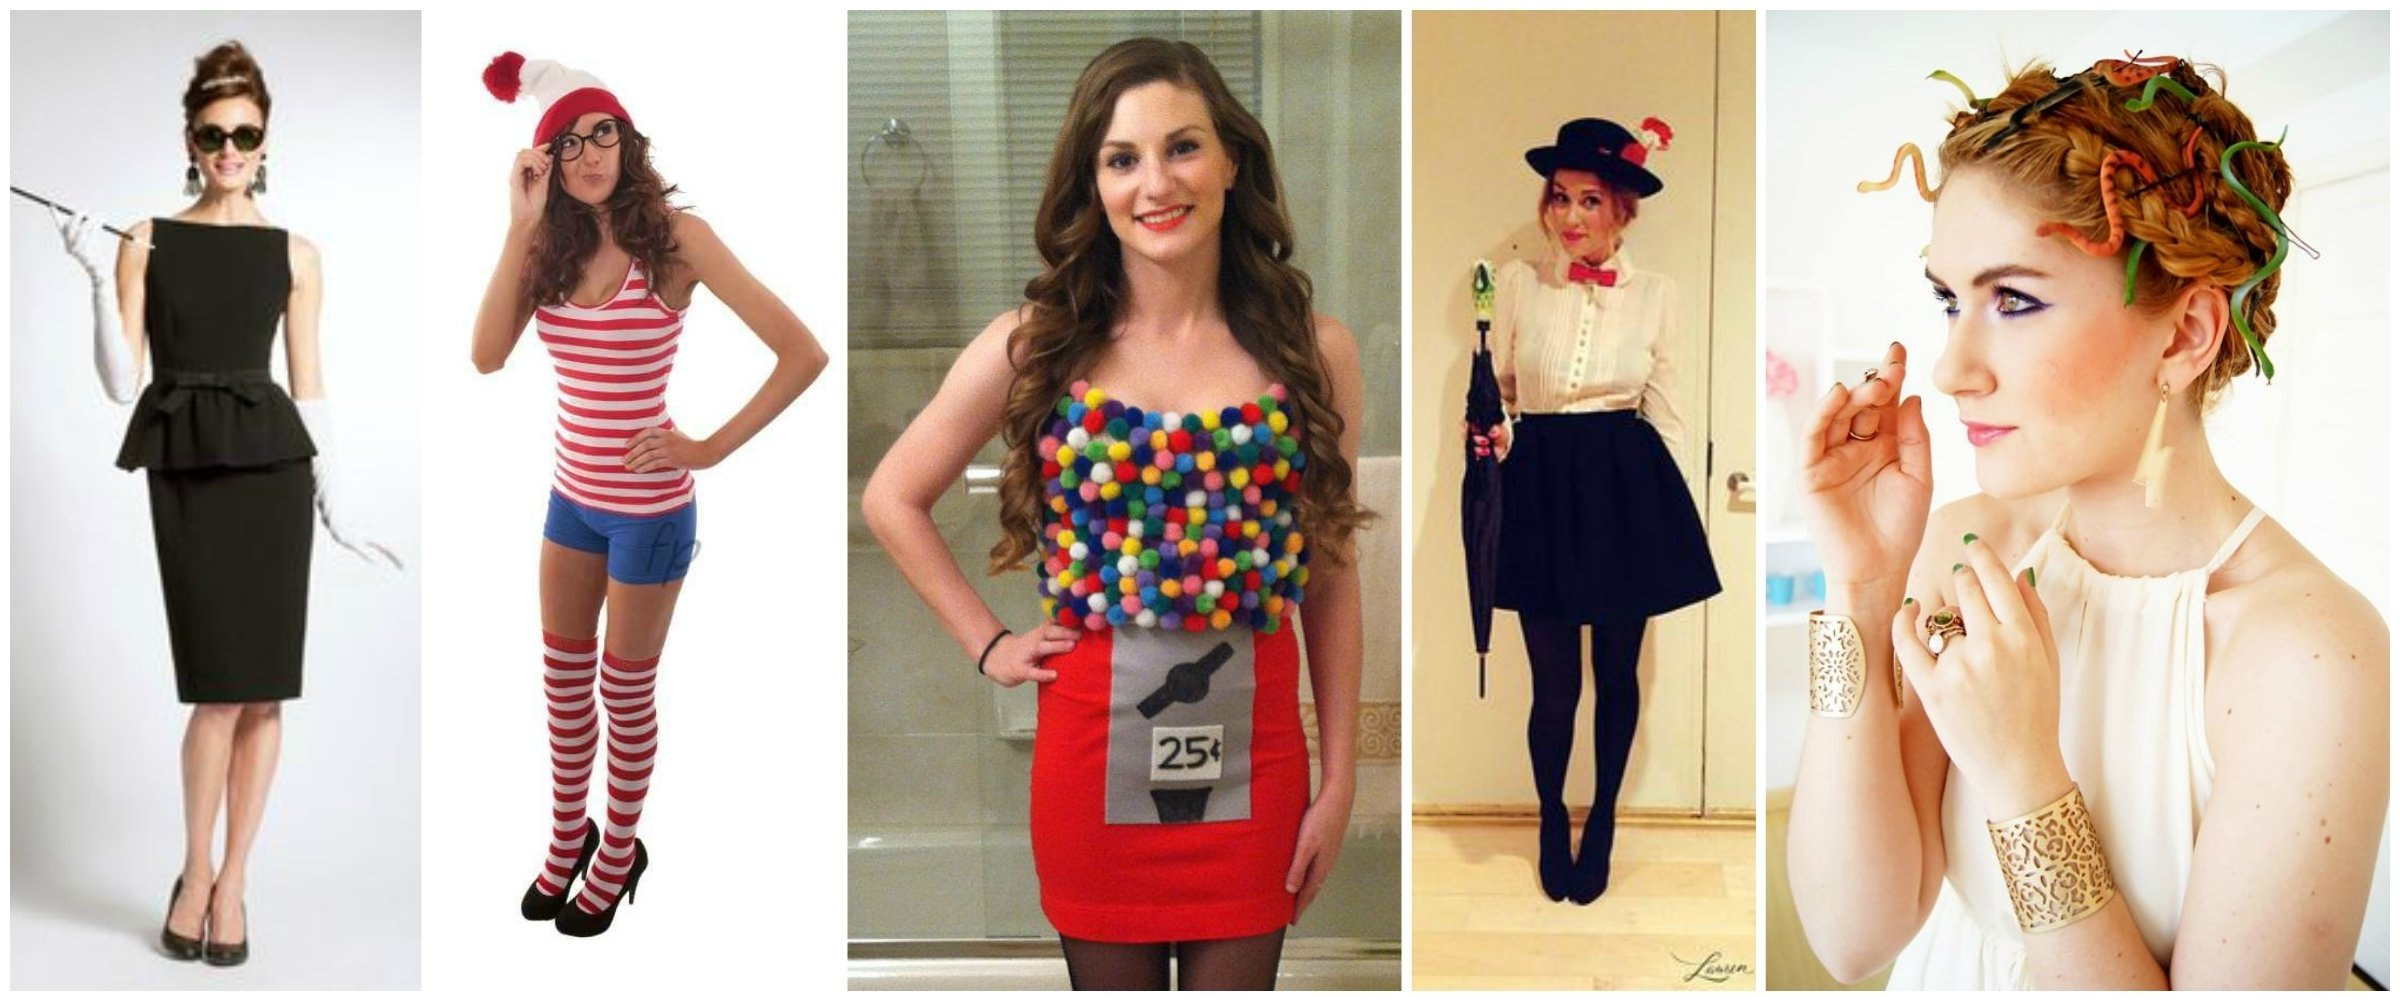 10 Stylish Make Your Own Halloween Costume Ideas image gallery homemade halloween costumes girls diy halloween 2 2020